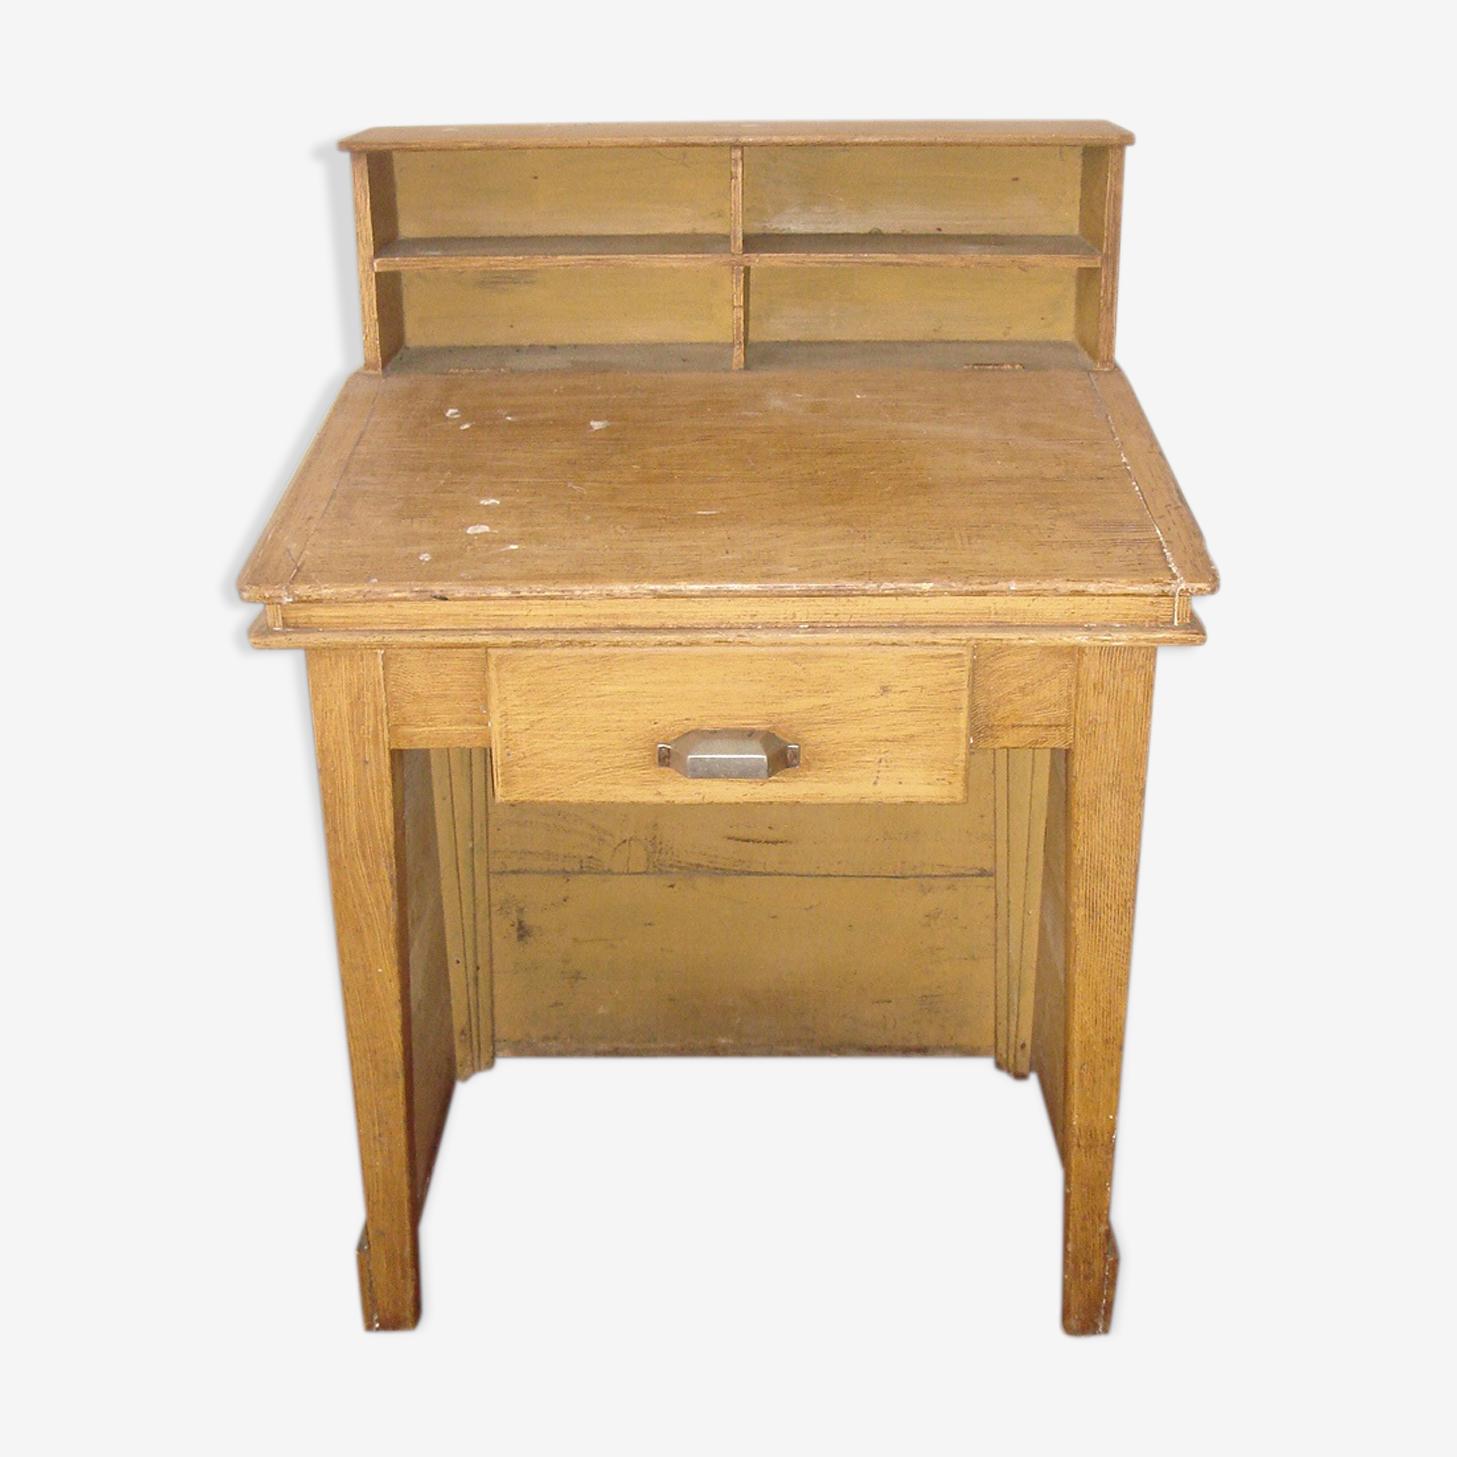 Art deco desk years 40/50